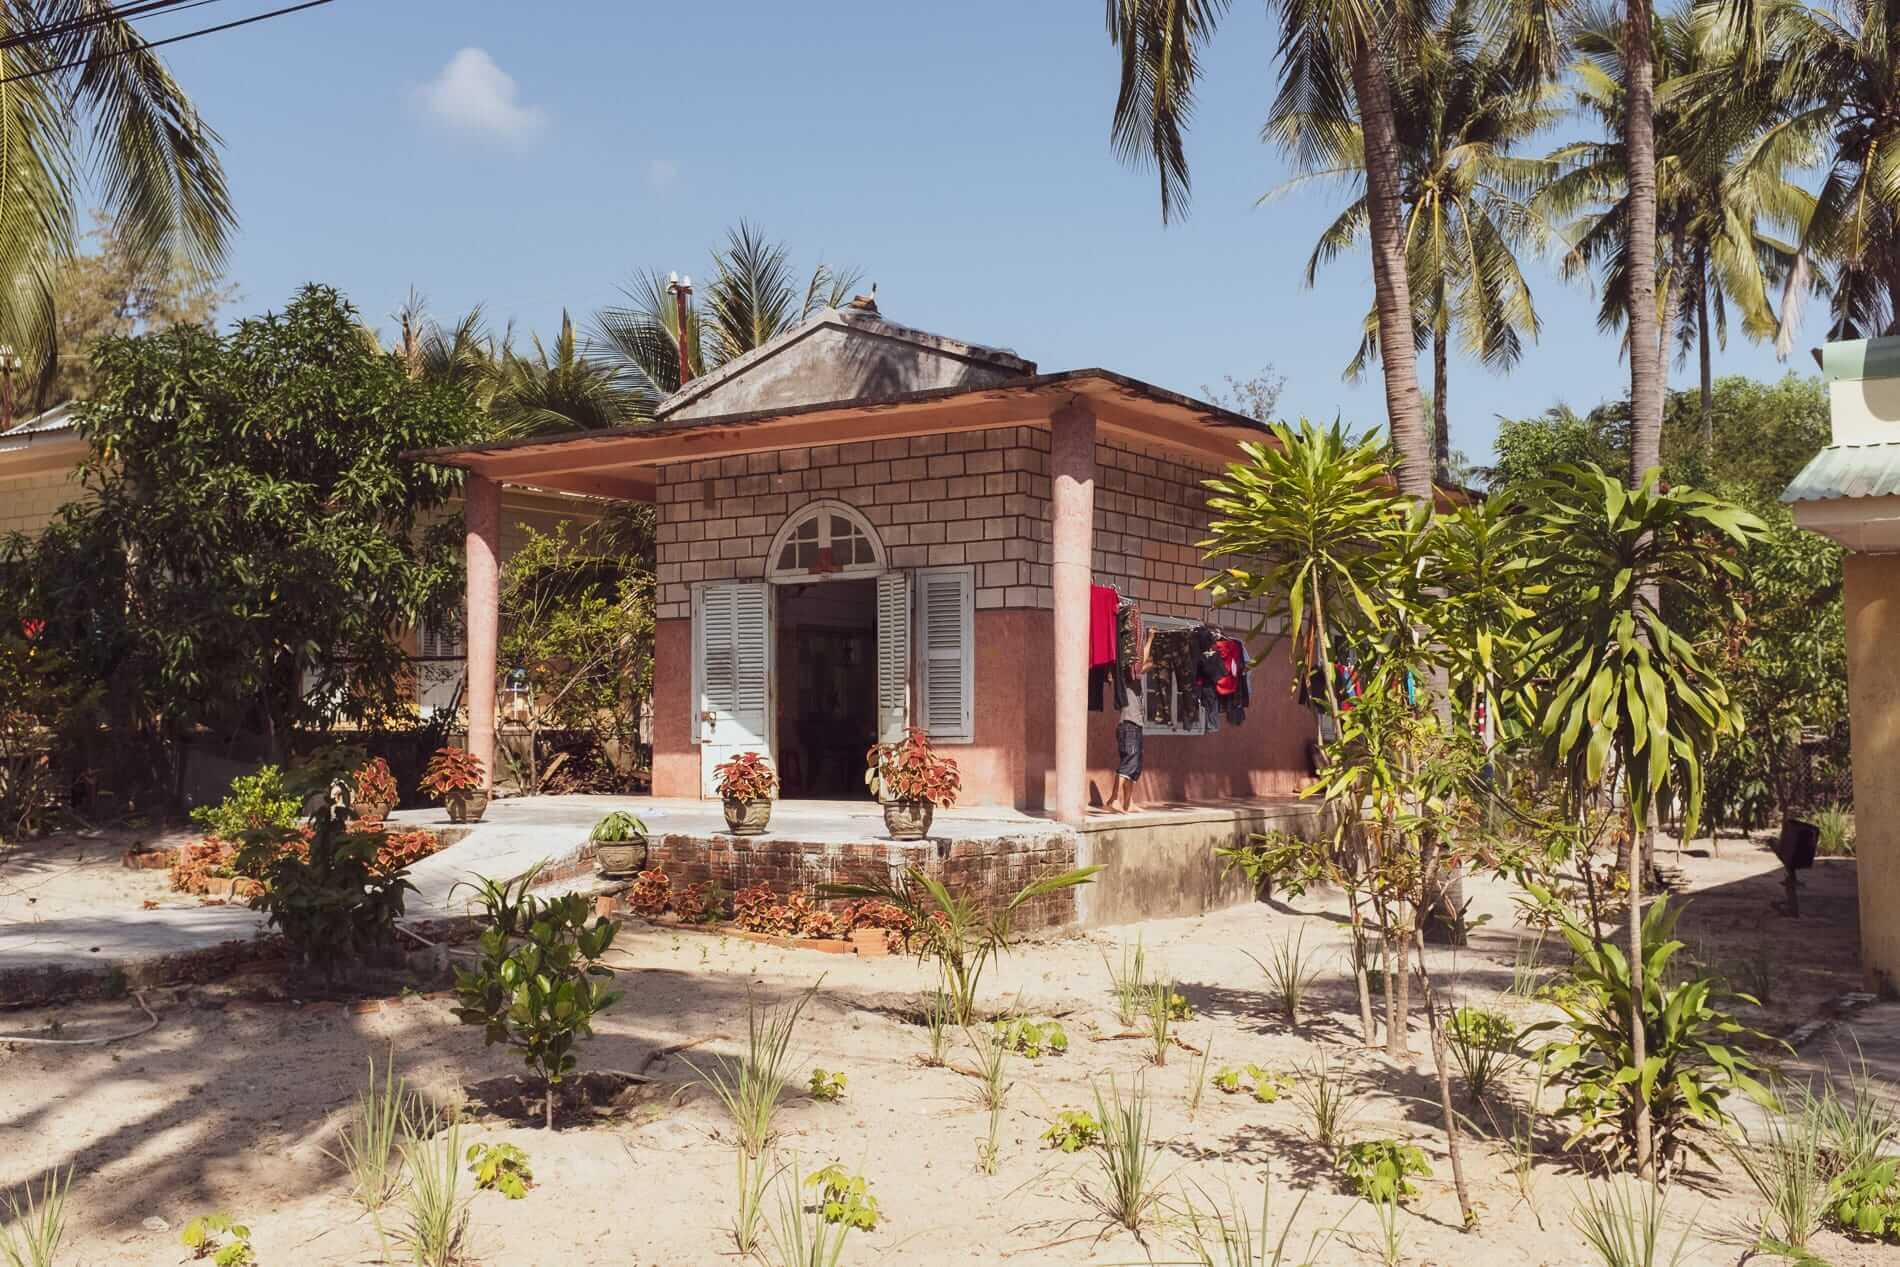 An Art Deco house under palm trees